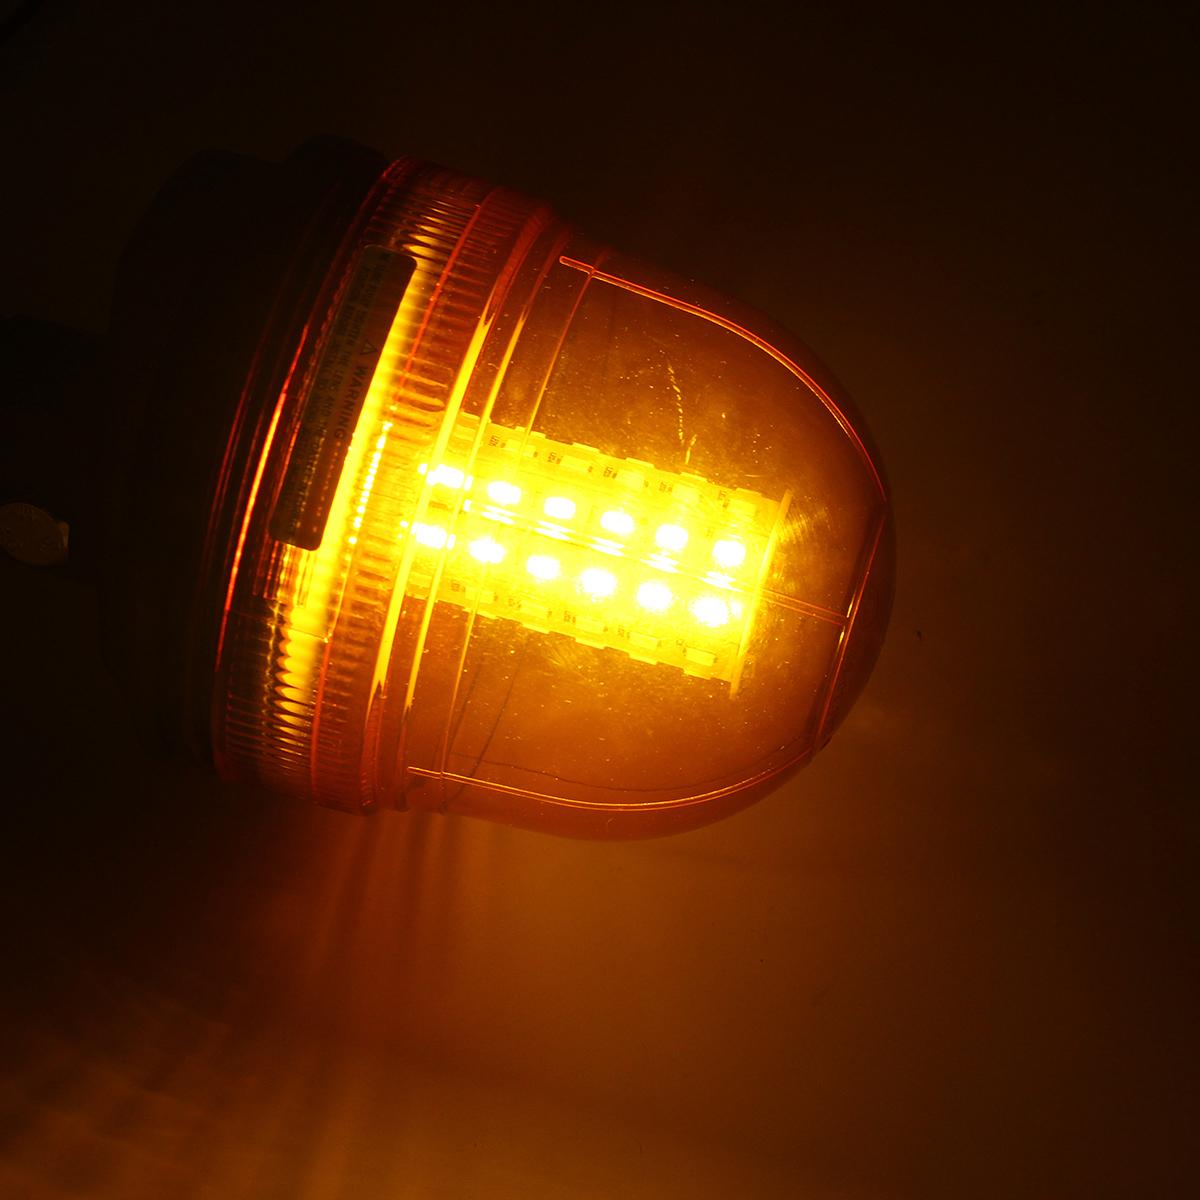 12V/24V LED Rotating Flashing Amber Beacon Waterproof Tractor ATV Motorcycle Warning Side Light